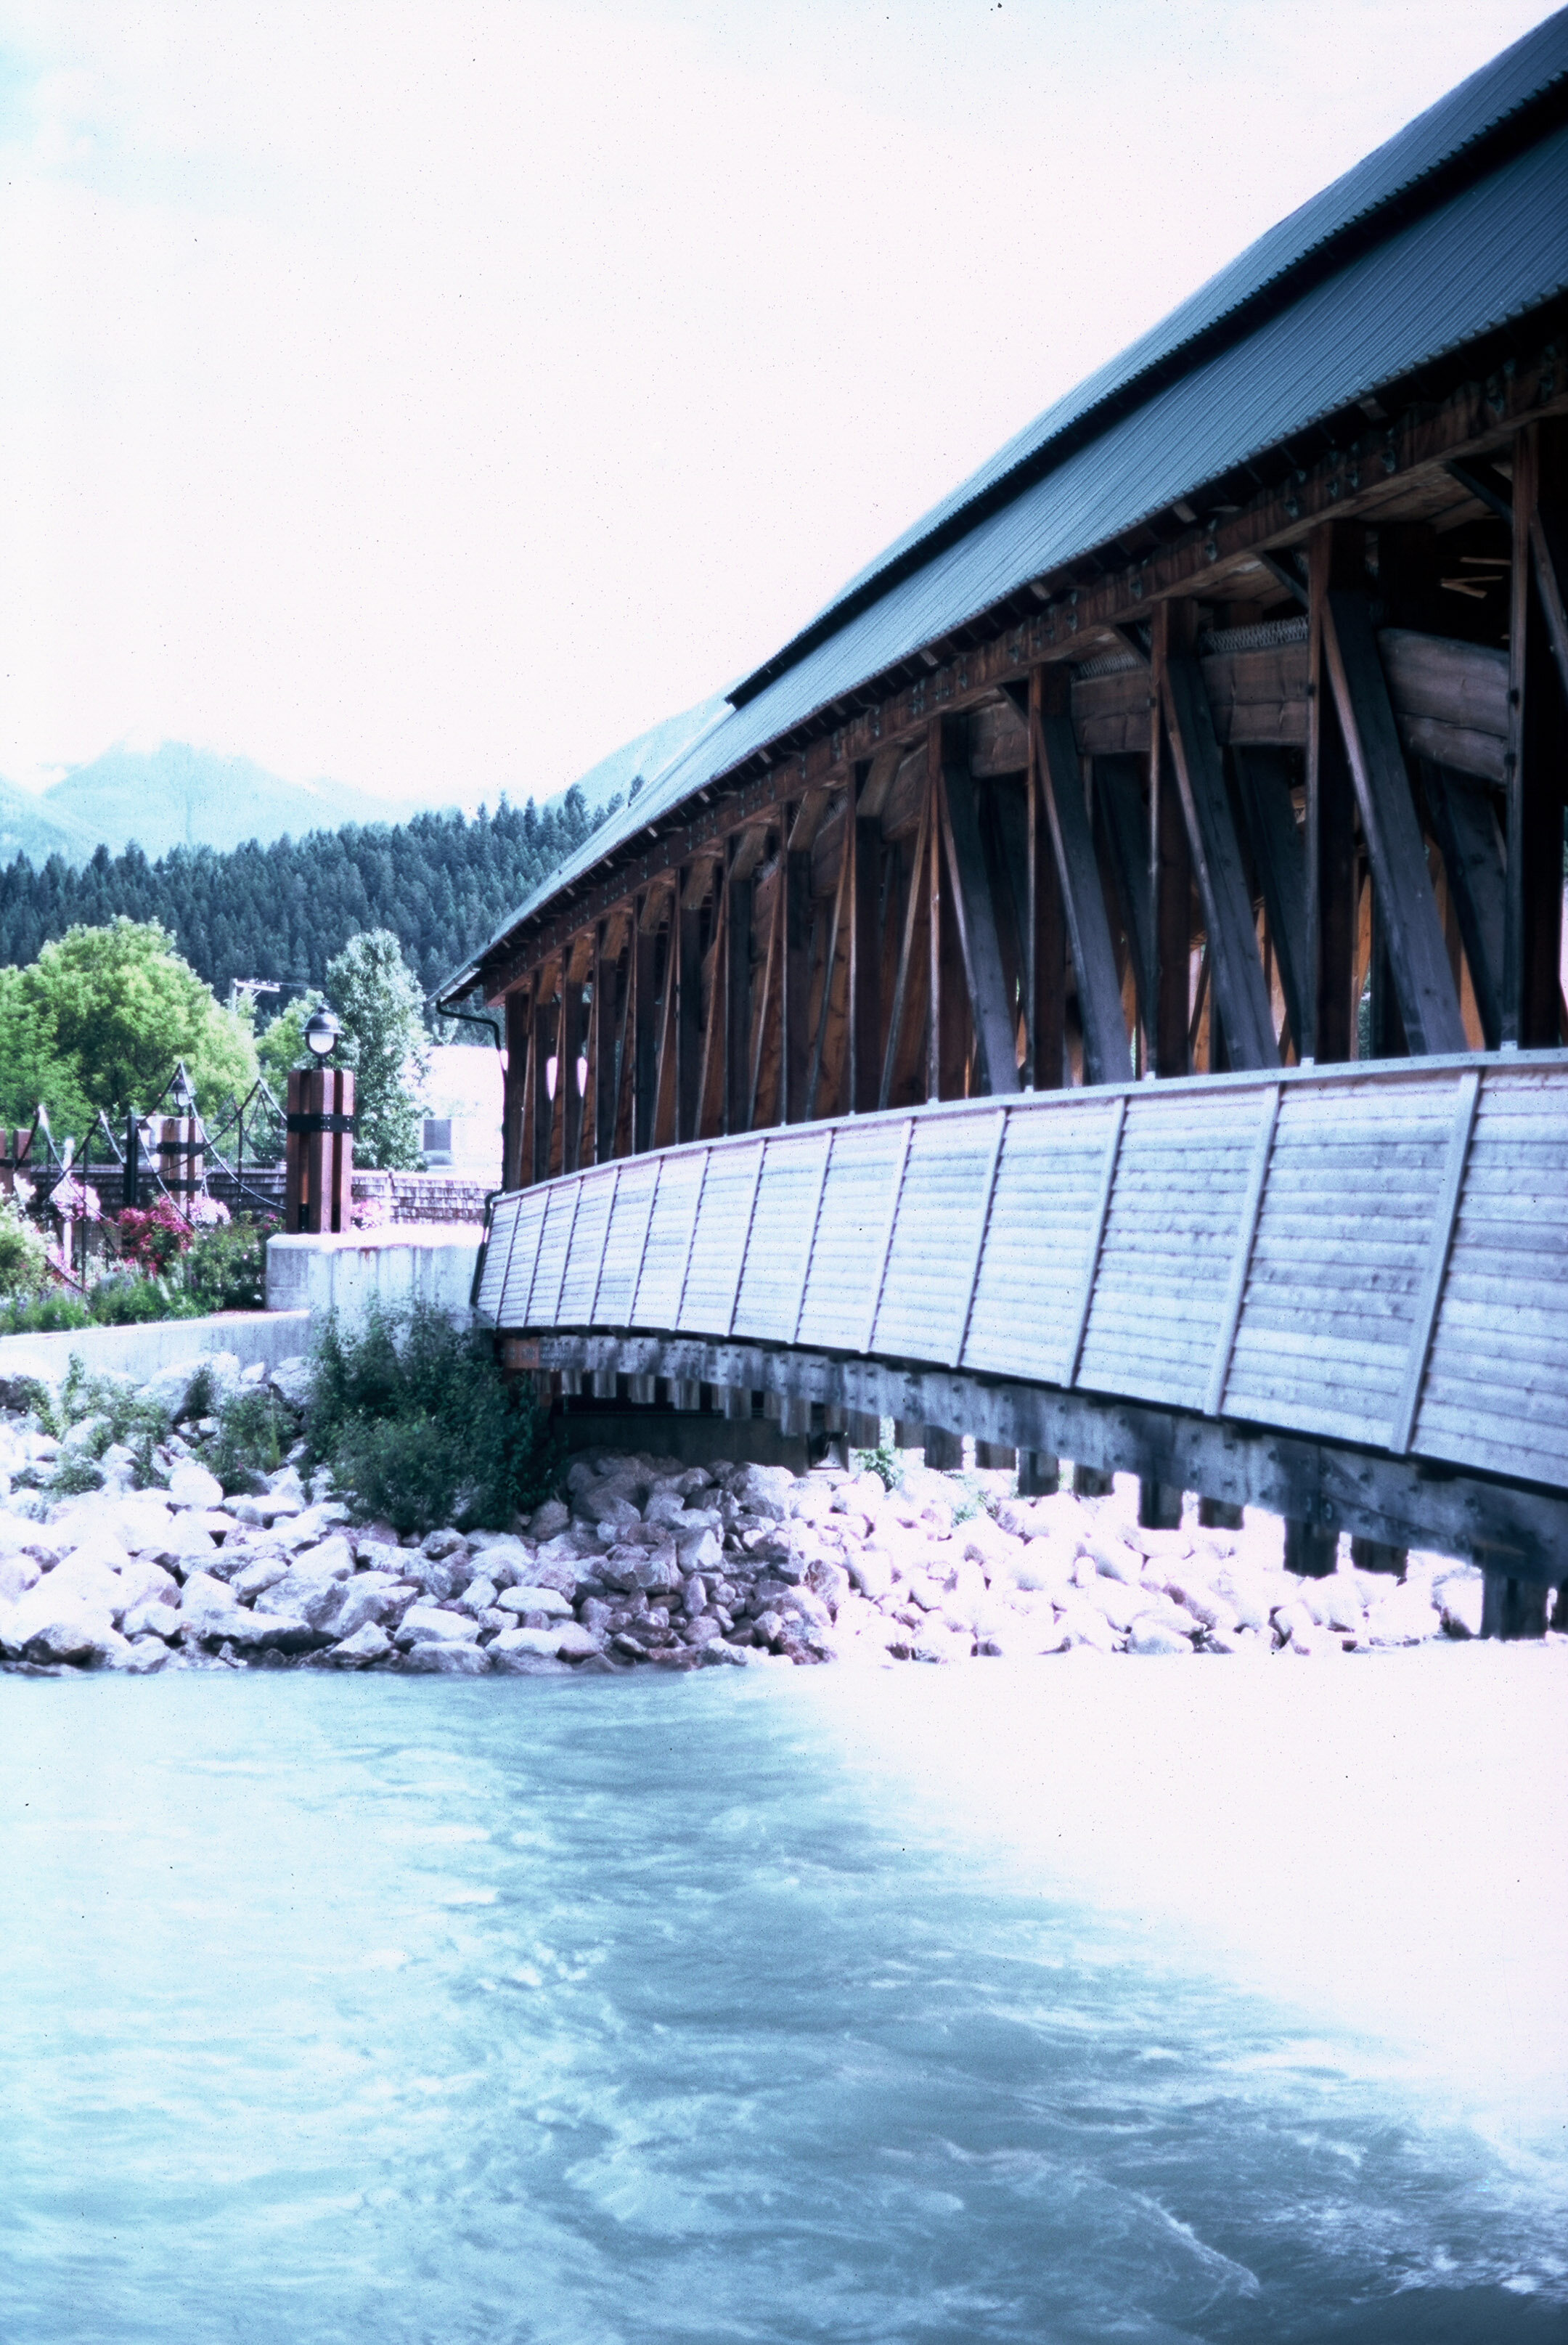 Canadian Rockies Banff Jasper Alberta Mountains 35mm SLR Canon A1 Sample Provia 100f Film Golden